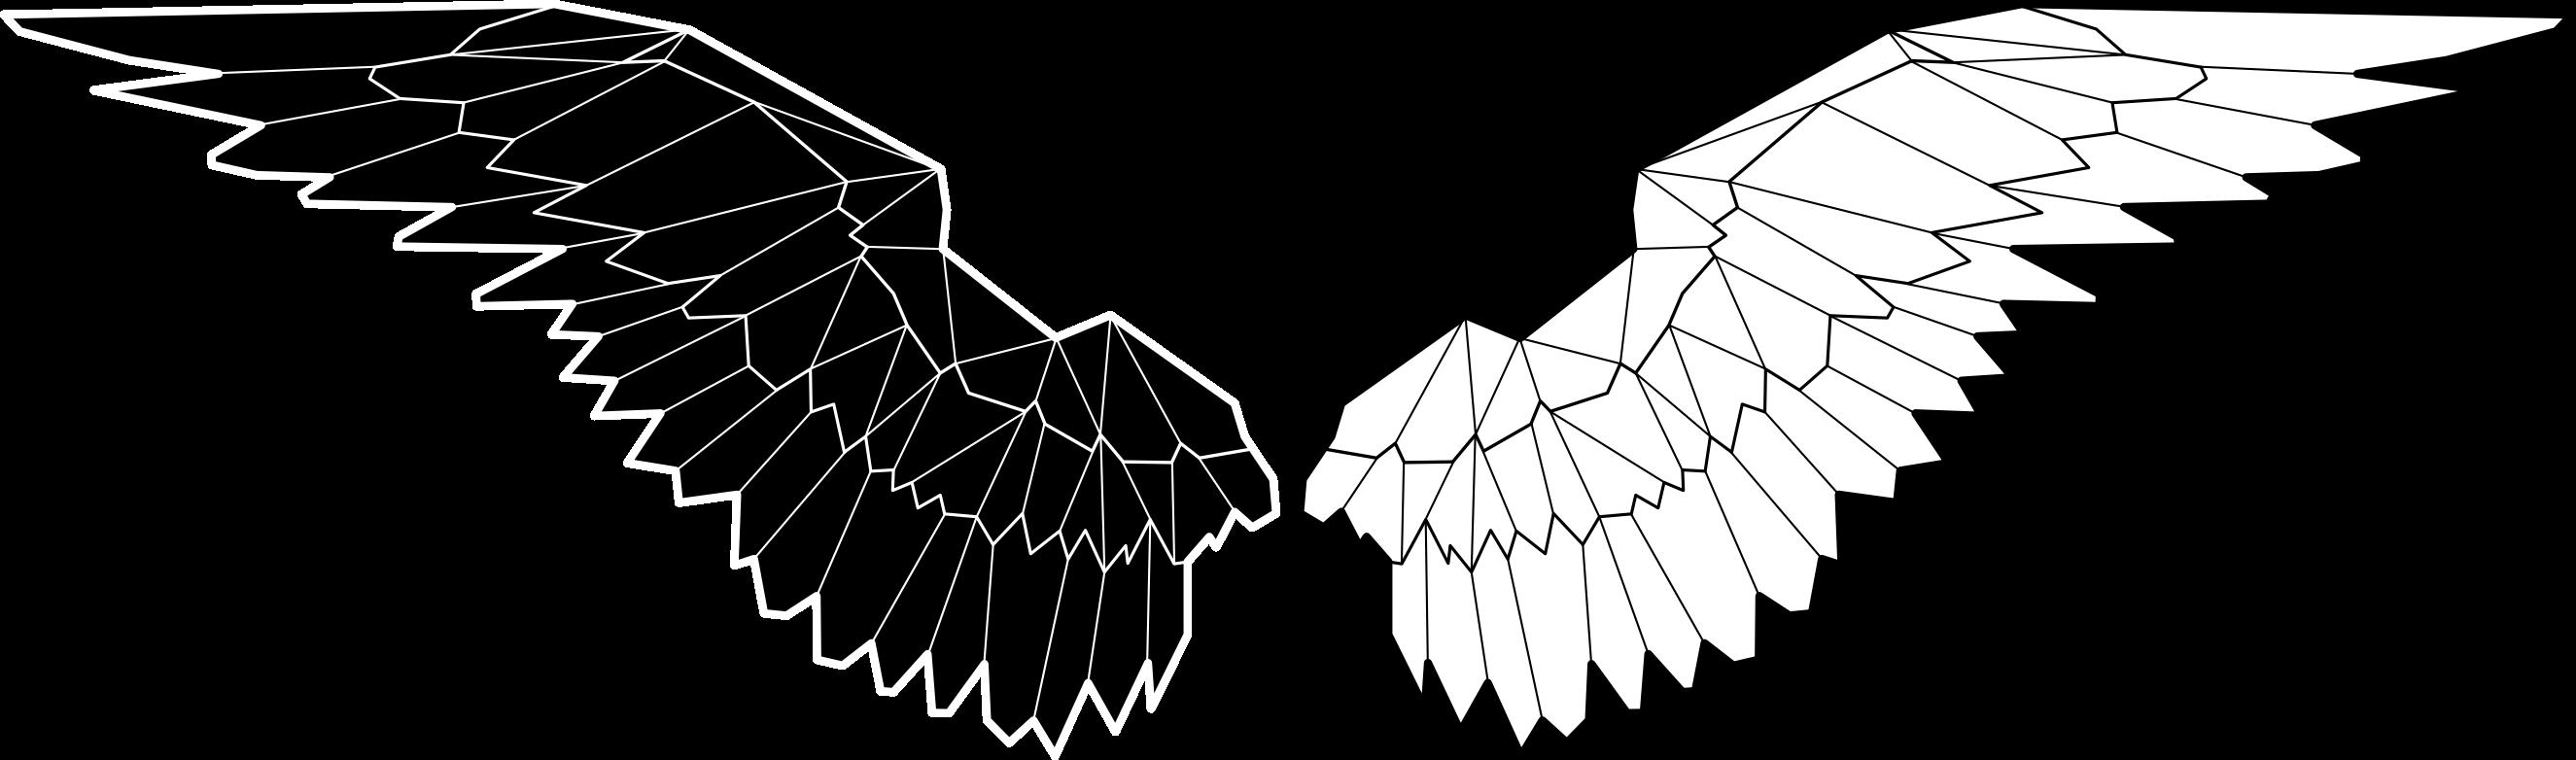 Skydivecollective logo white bg a3vett